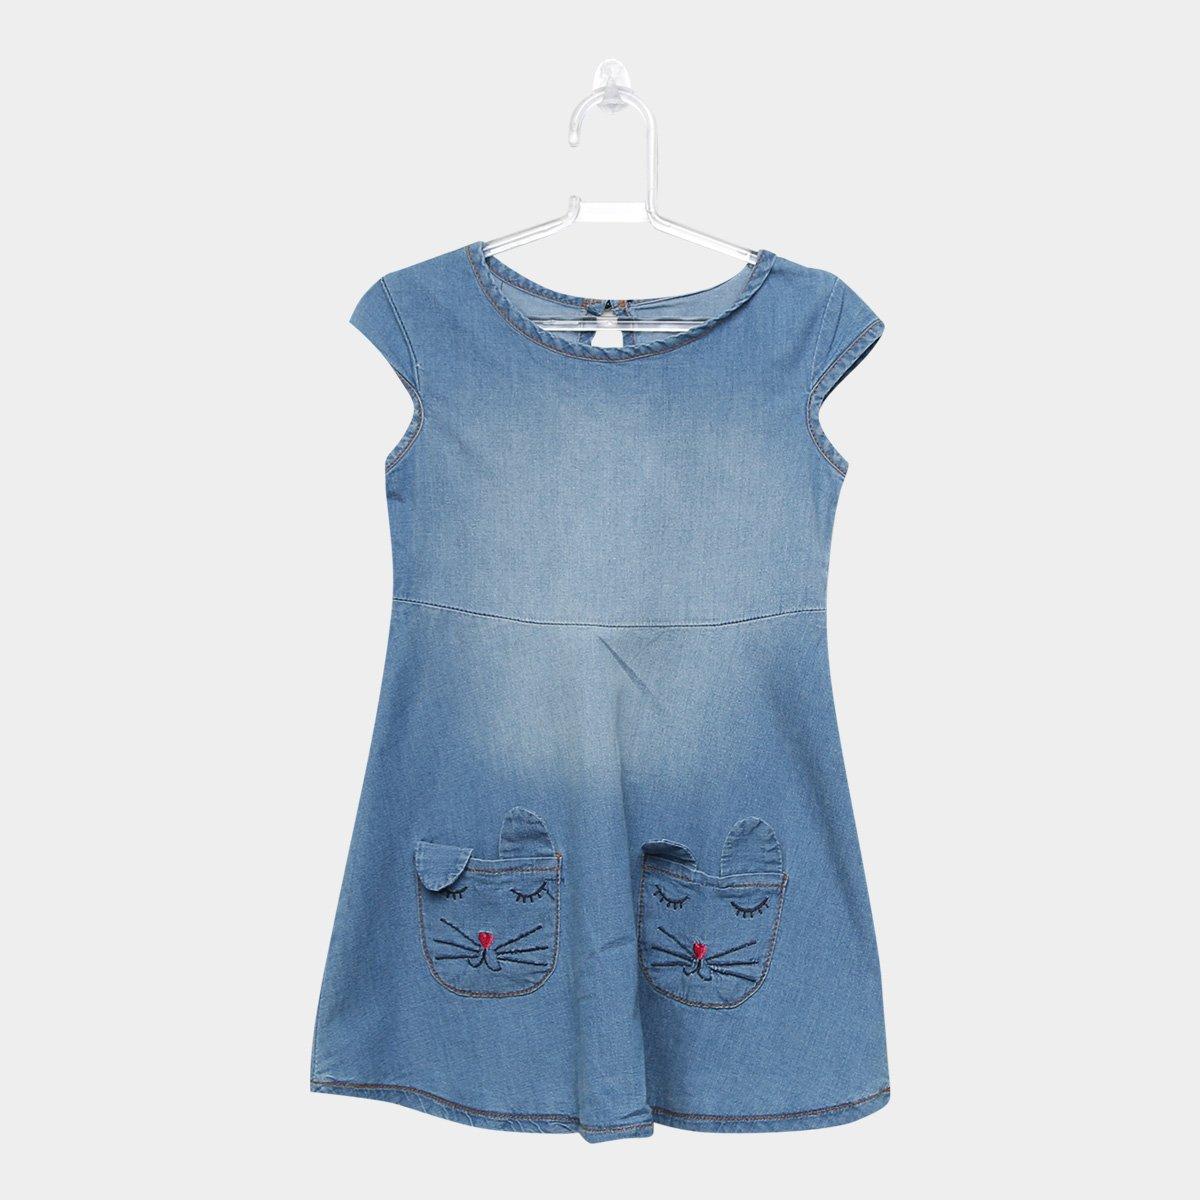 aebc798bb Vestido Jeans Infantil Cativa Bordado Gatinho Feminino